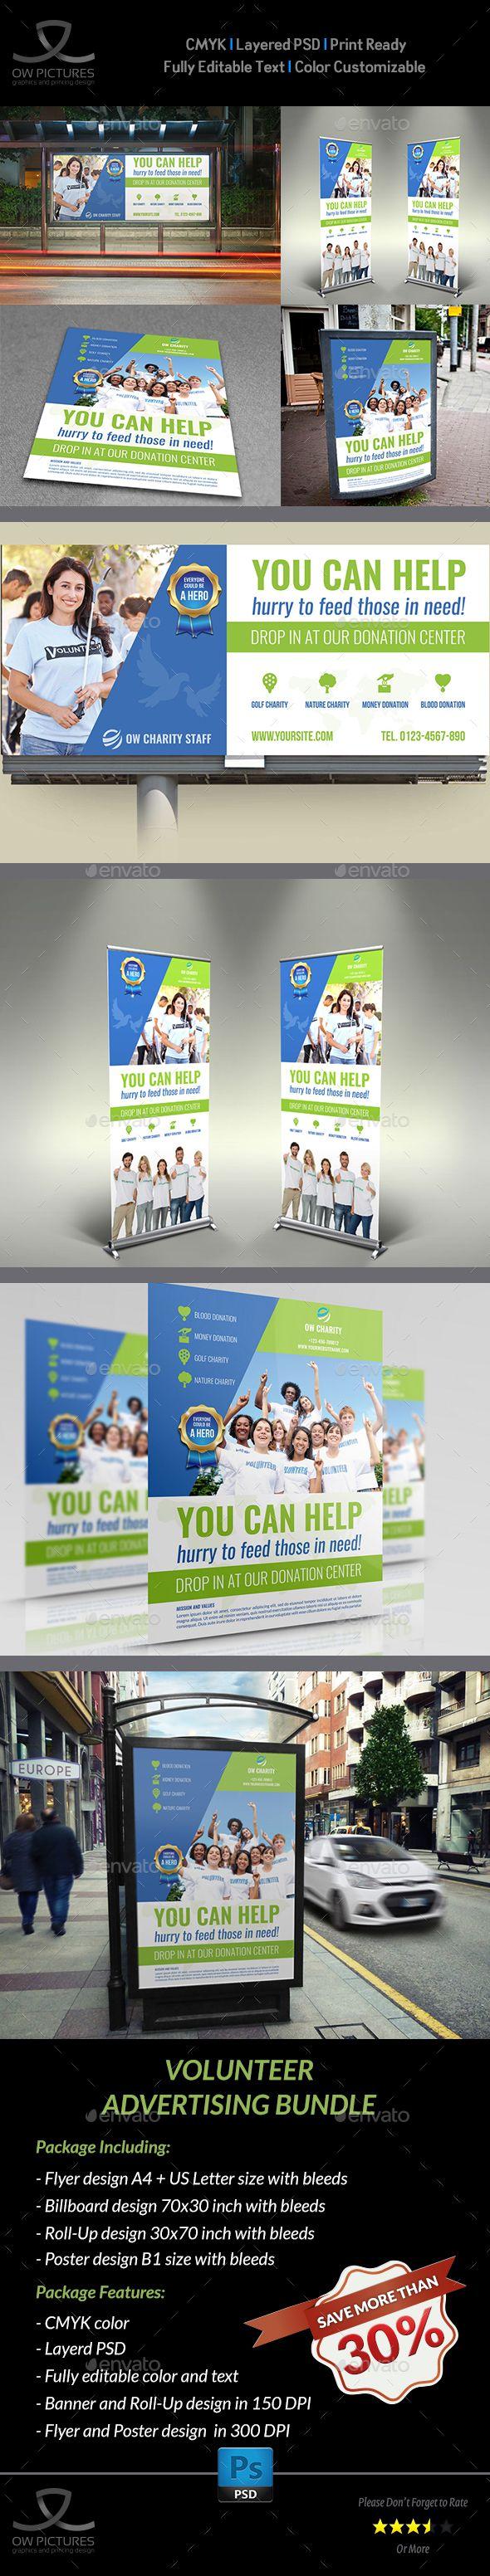 Volunteer Advertising Bundle by OWPictures Advertising Package Description : Vol...